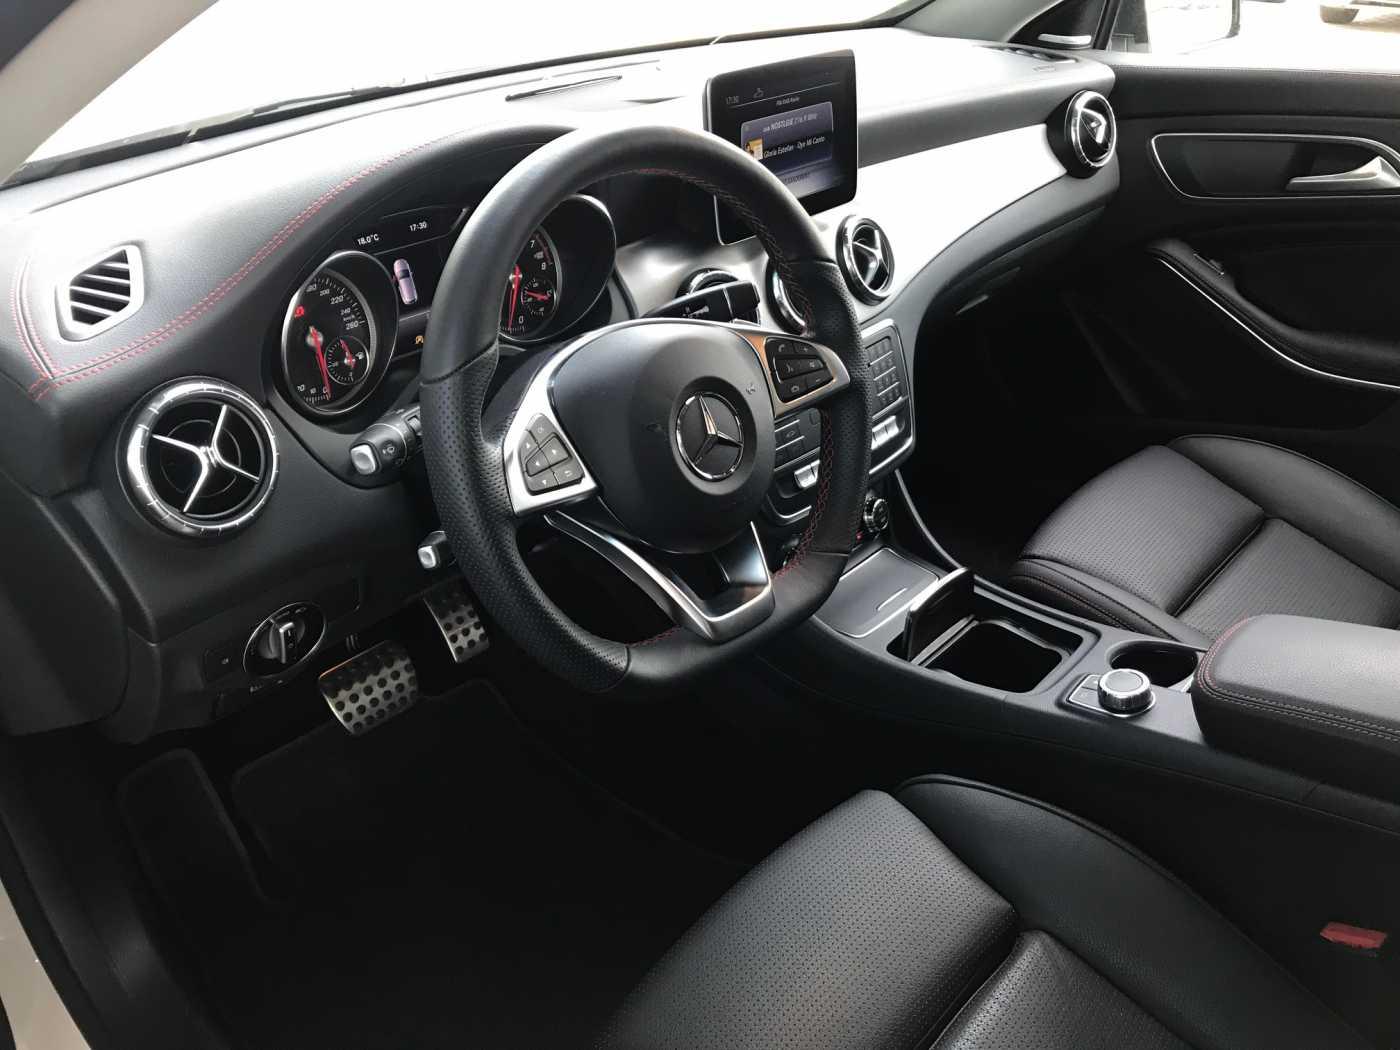 Mercedes CLA 200 2/13